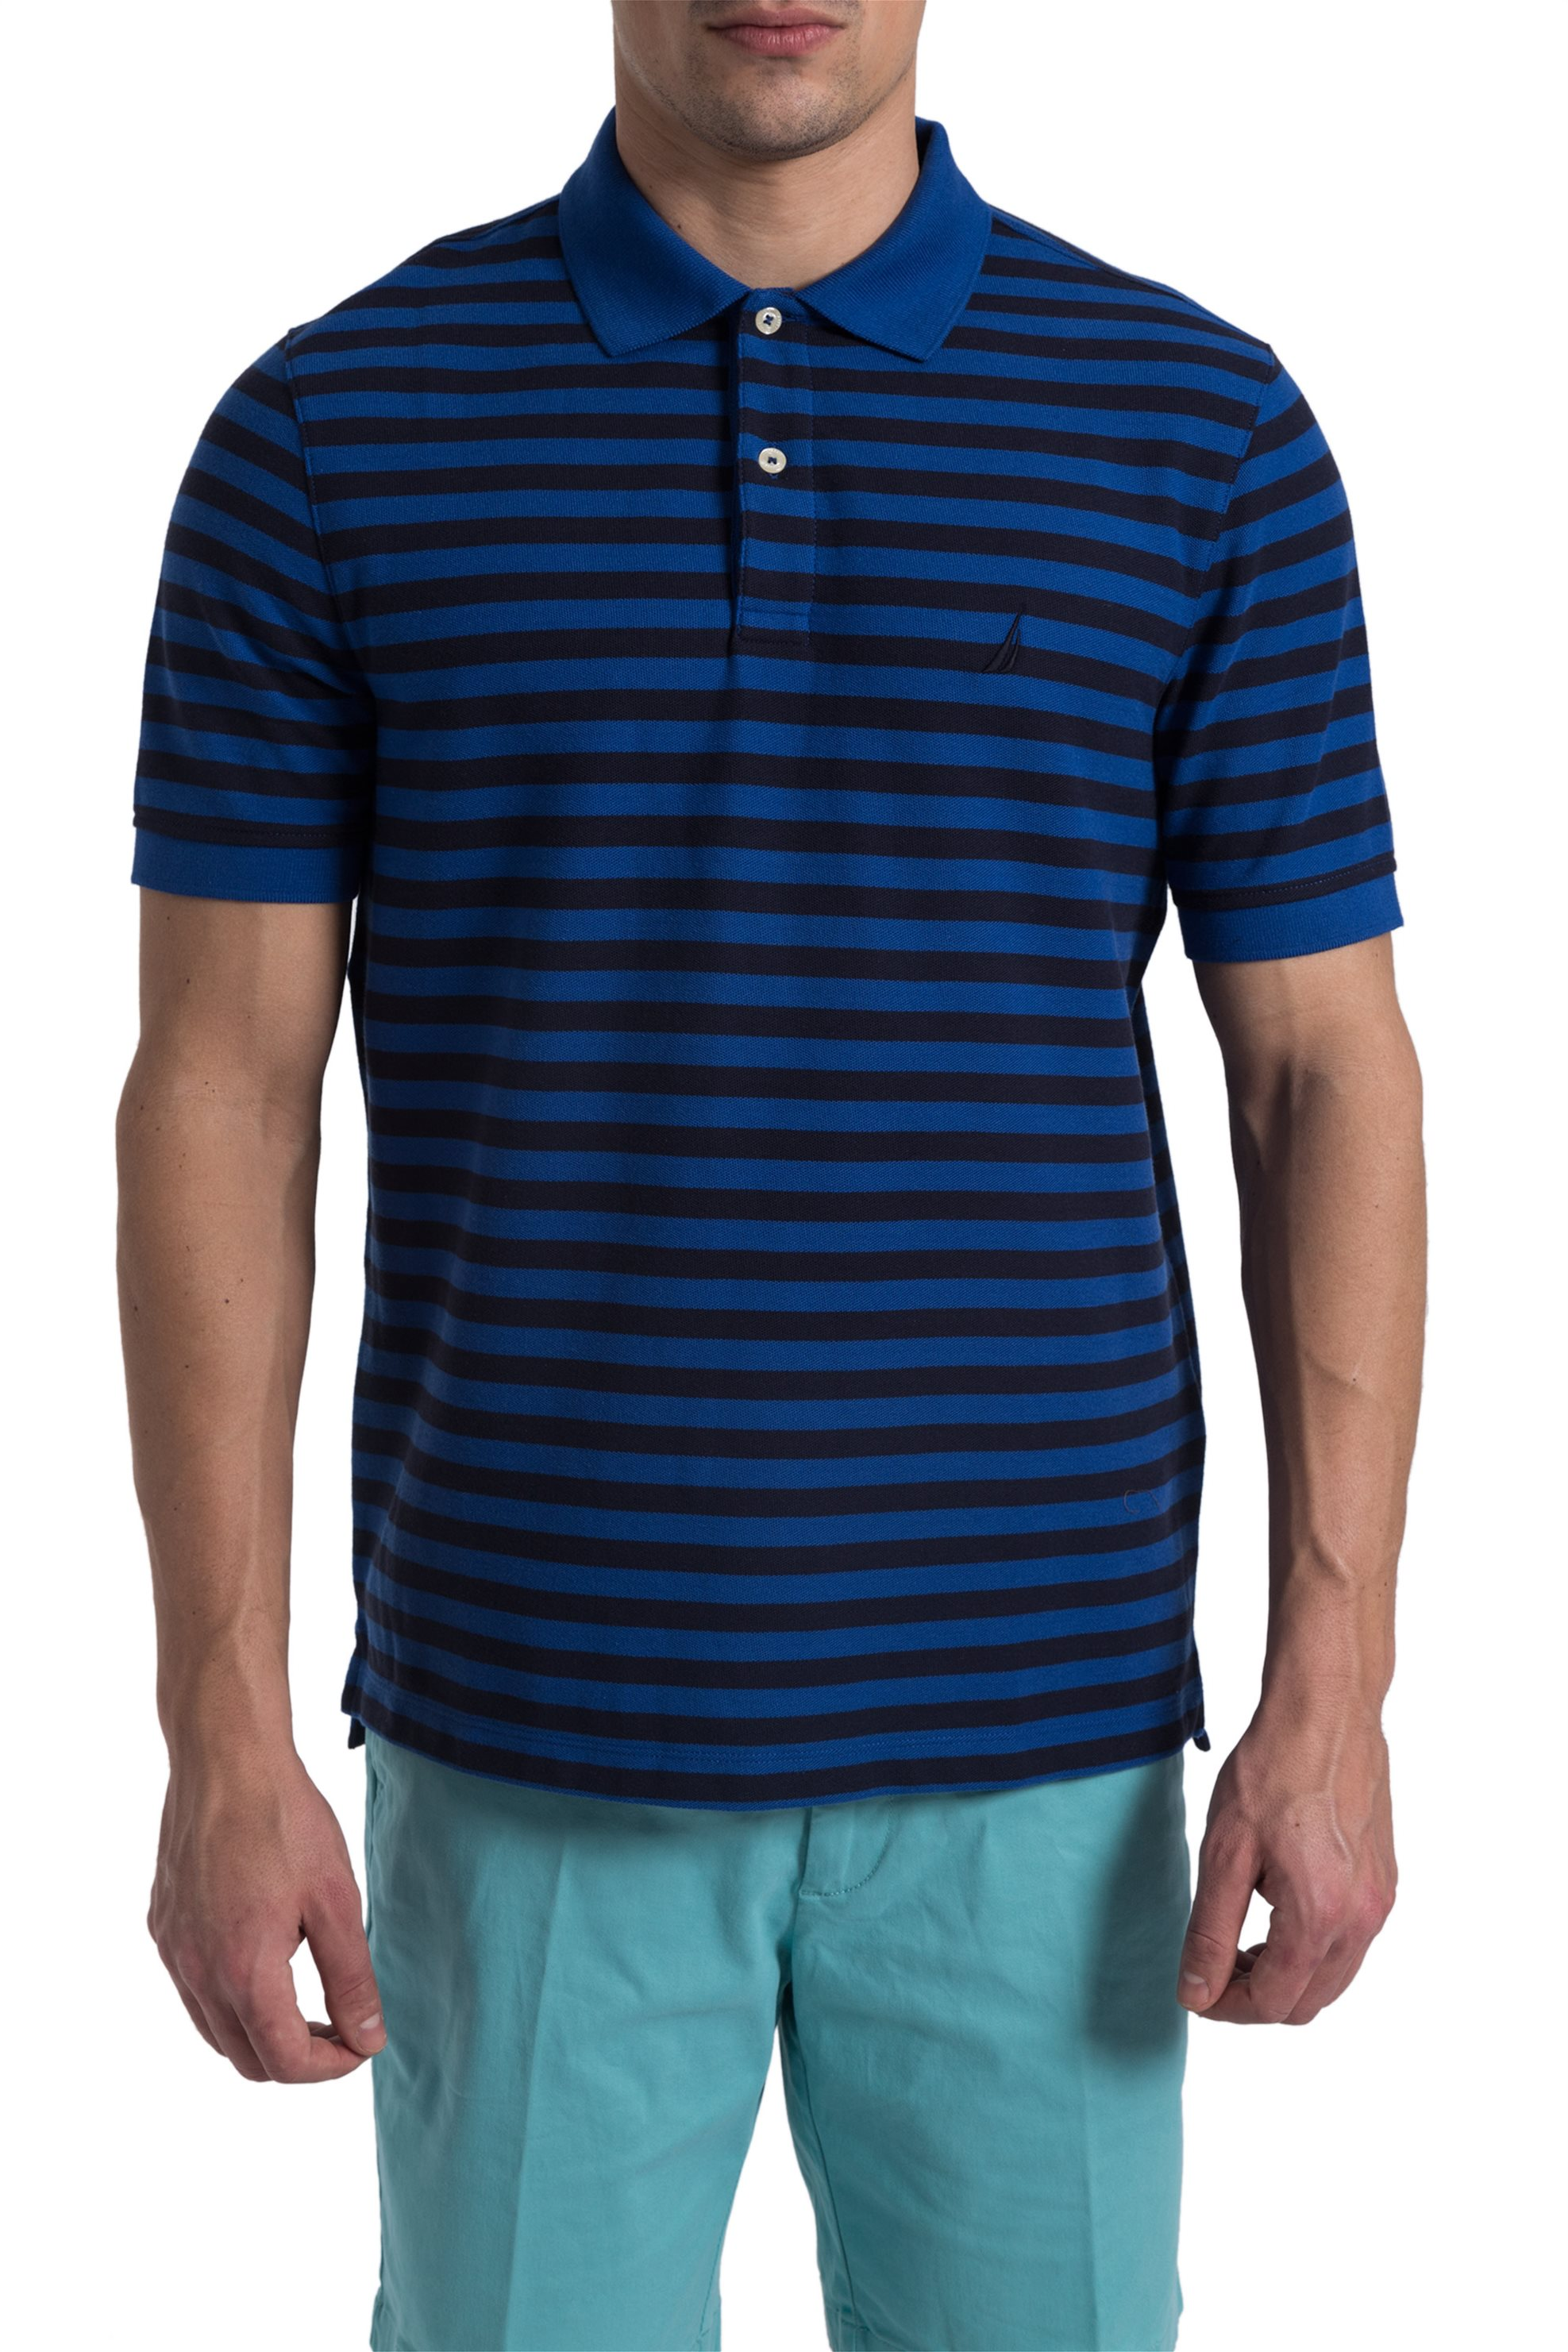 85f11228e802 Ανδρική ριγέ μπλούζα polo Nautica - K81003 - Μπλε Ηλεκτρίκ